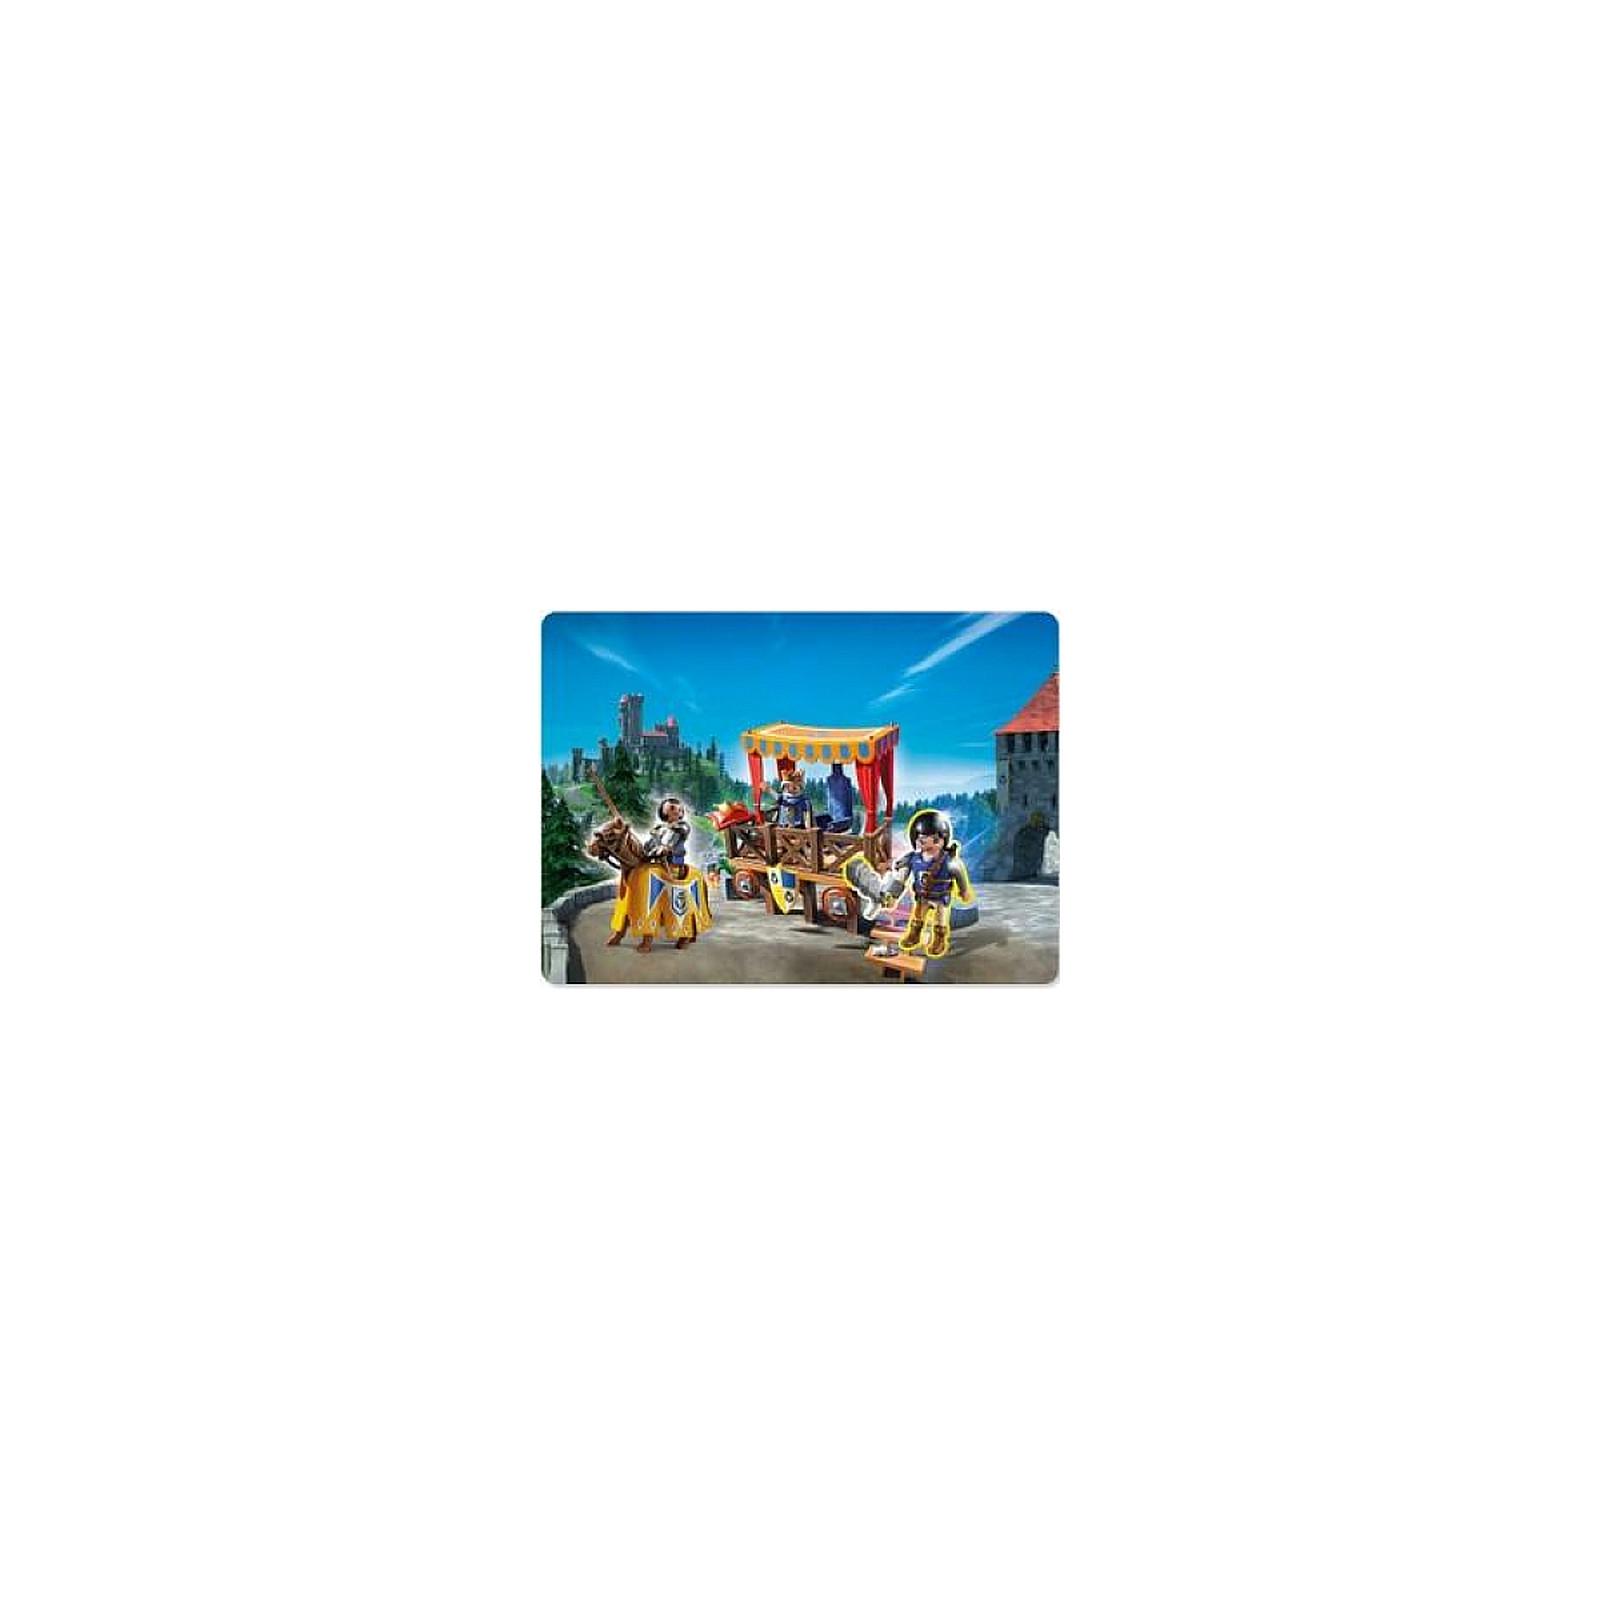 Playmobil Super 4 Tribune Royale avec Alex 6695 Knights Chevalier